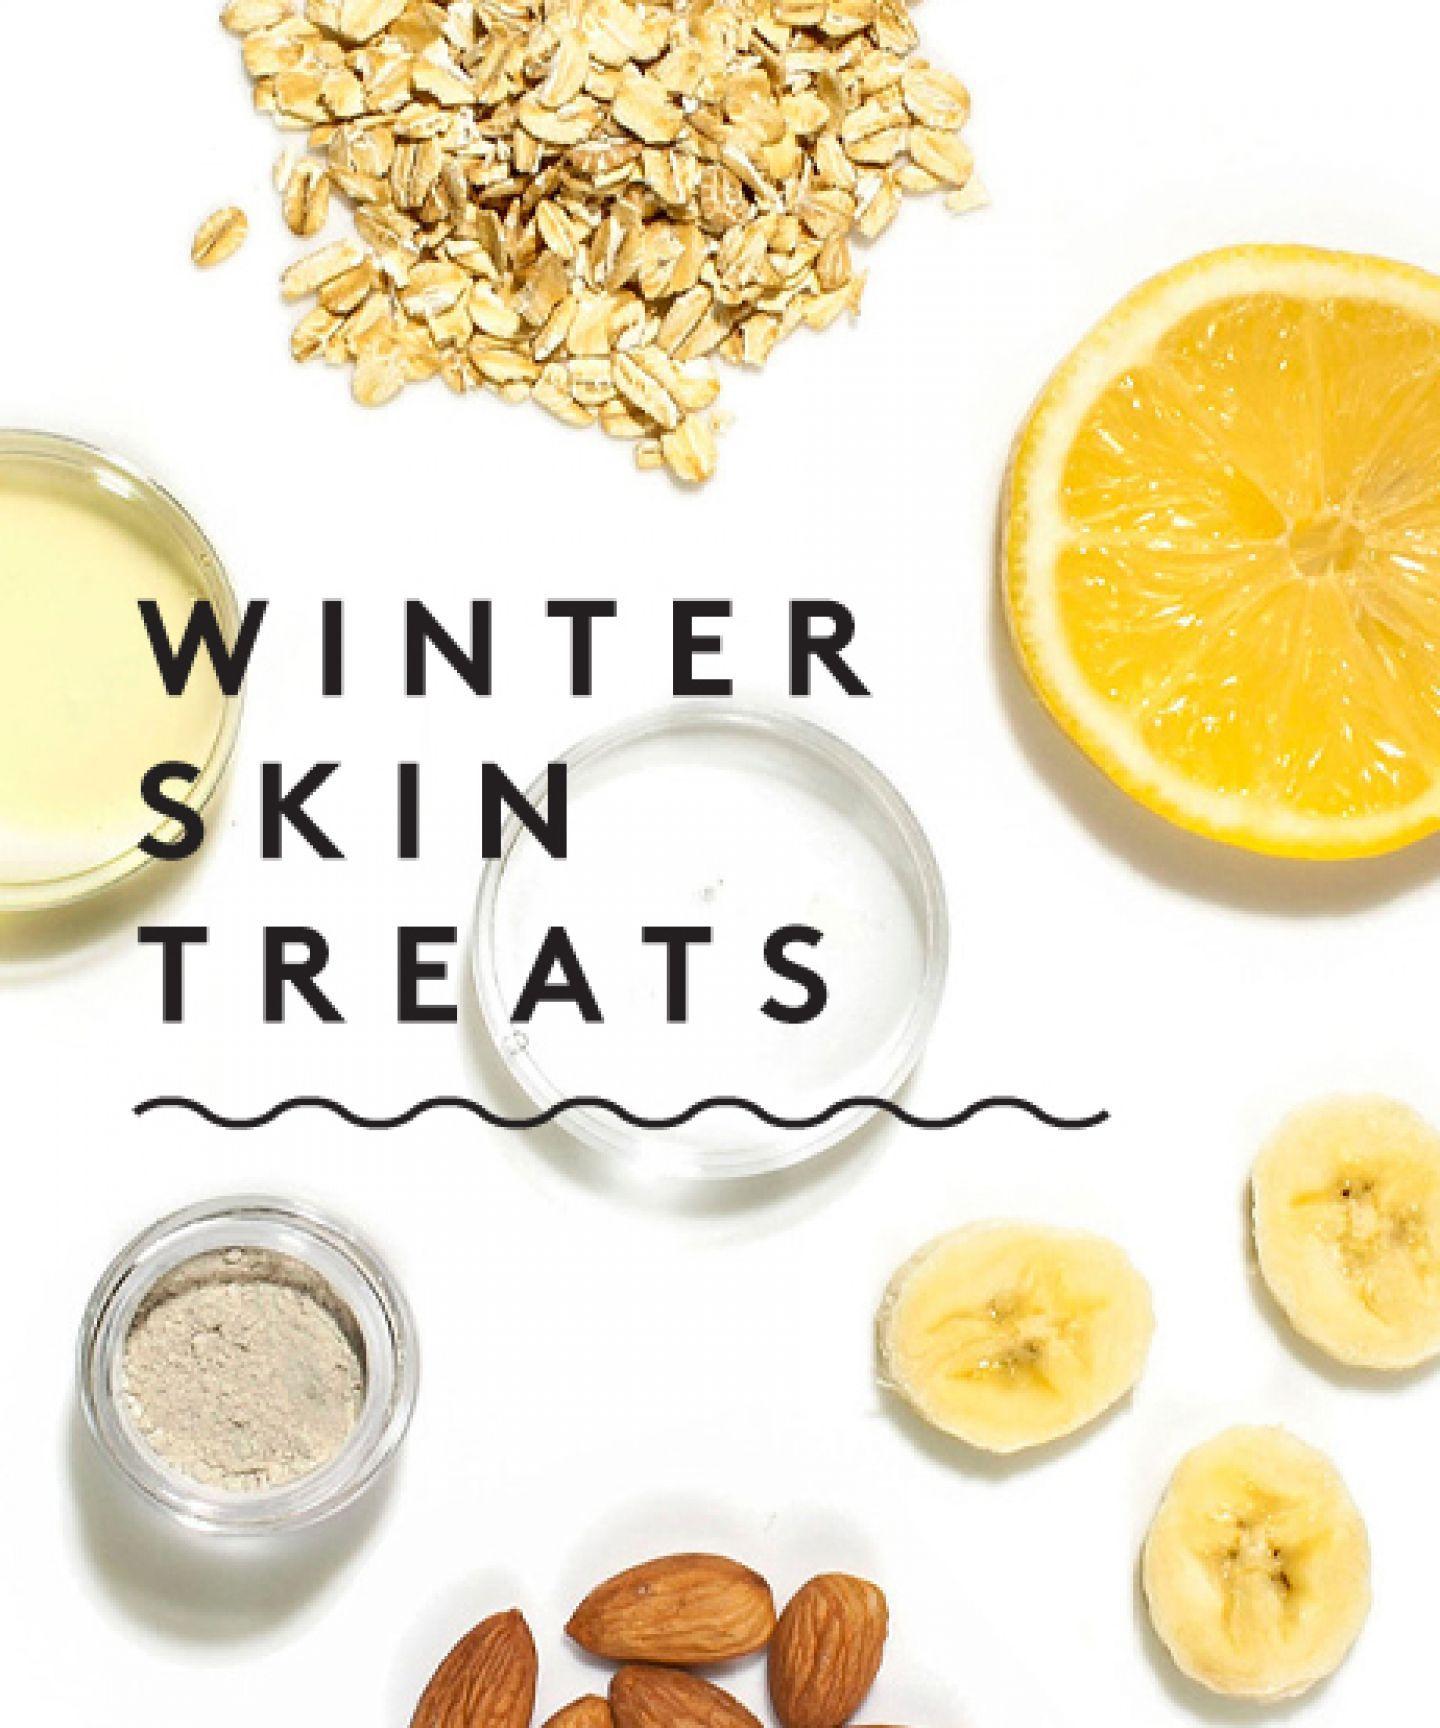 DIY Winter Skin Care - Organic Homemade Beauty  Winter skin care